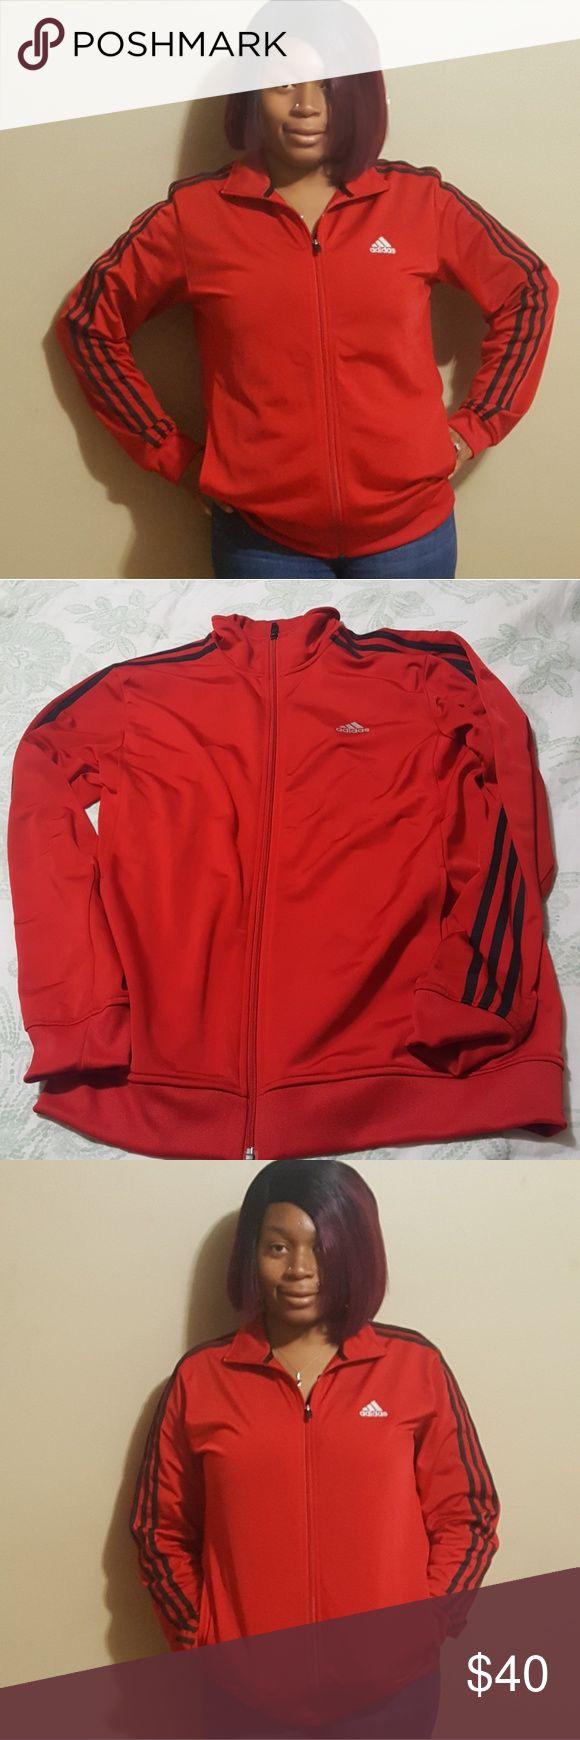 Adidas (mens ) jacket Red Adidas men's medium jacket . Worn twice ,very good condition . adidas Jackets & Coats Lightweight & Shirt Jackets